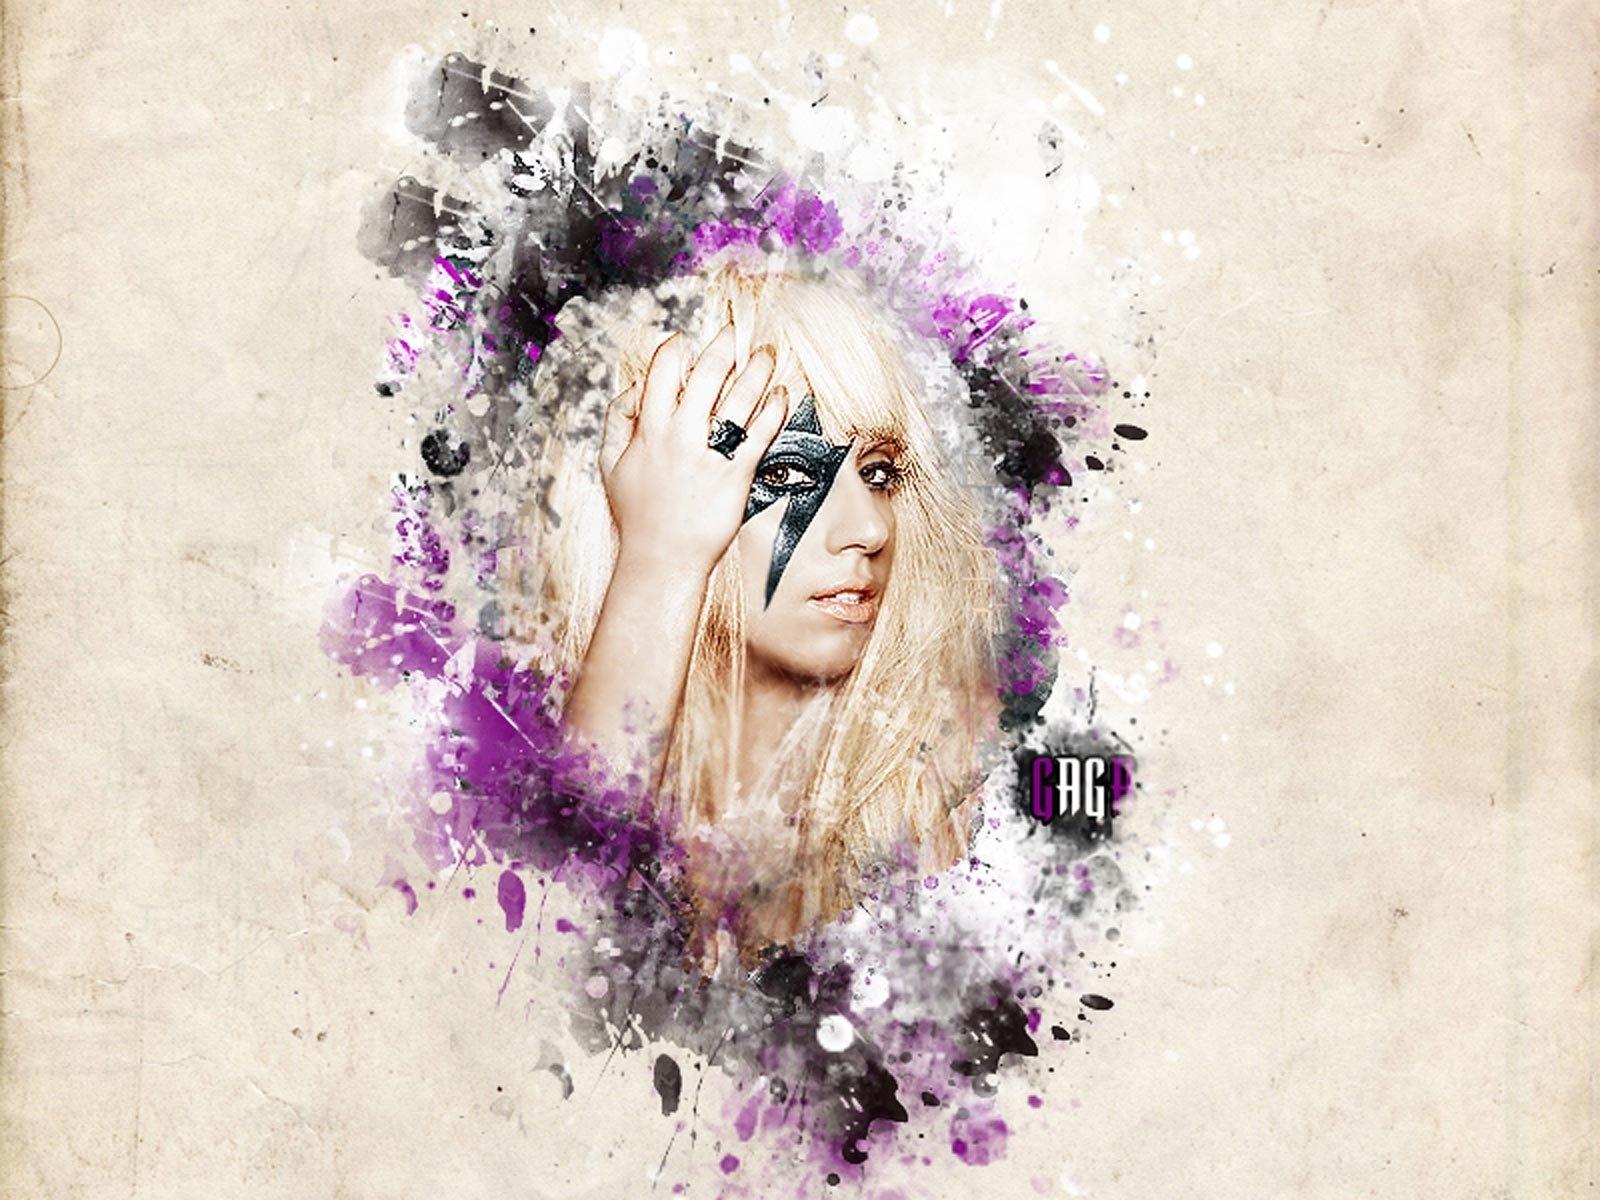 Lady gaga wallpaper download